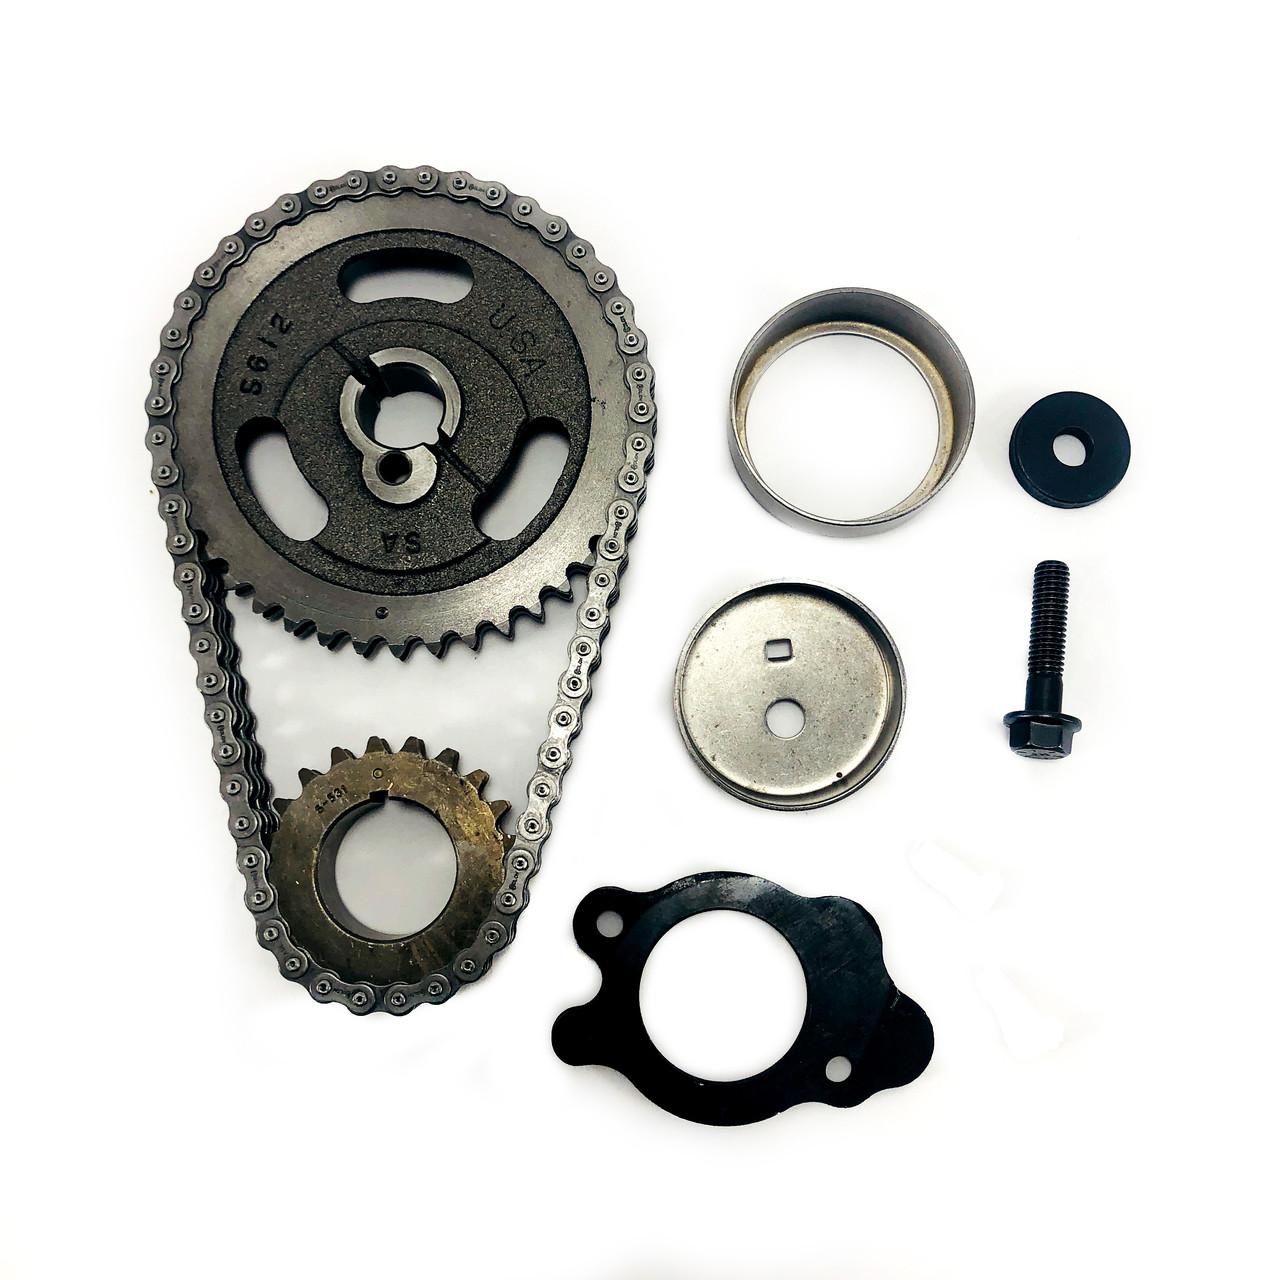 SBF 289 / 302 Ford Stage 2 RV Master Engine Rebuild Kit Camshaft Pistons Gaskets